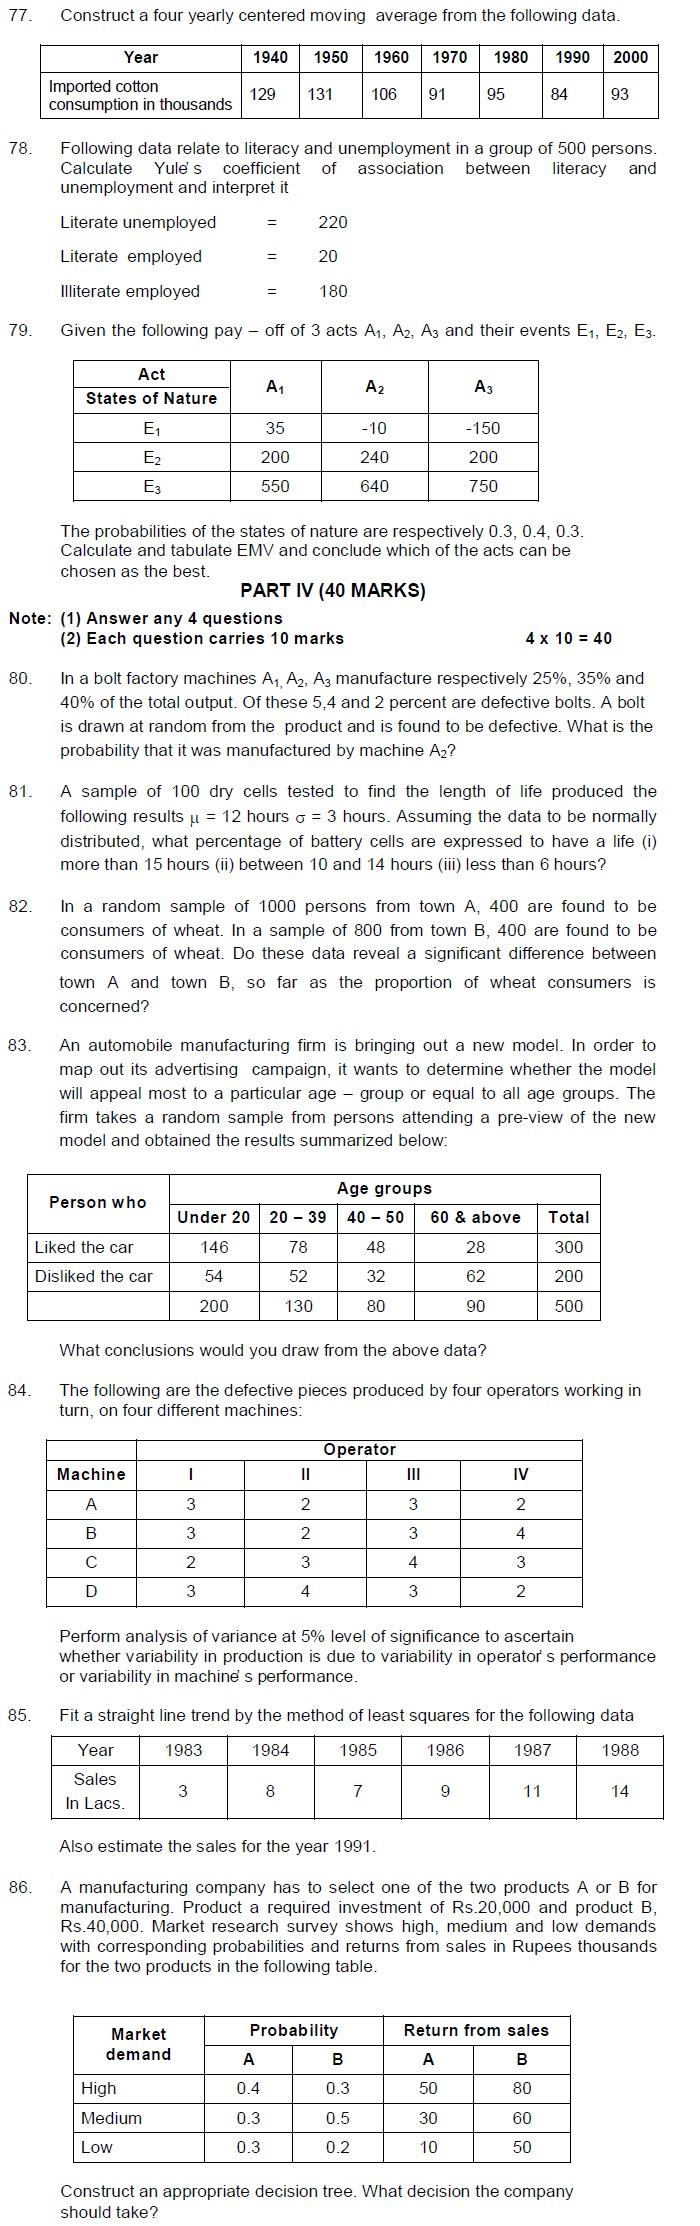 Tamil Nadu State Board Class 12 Model Question Paper - Statistics